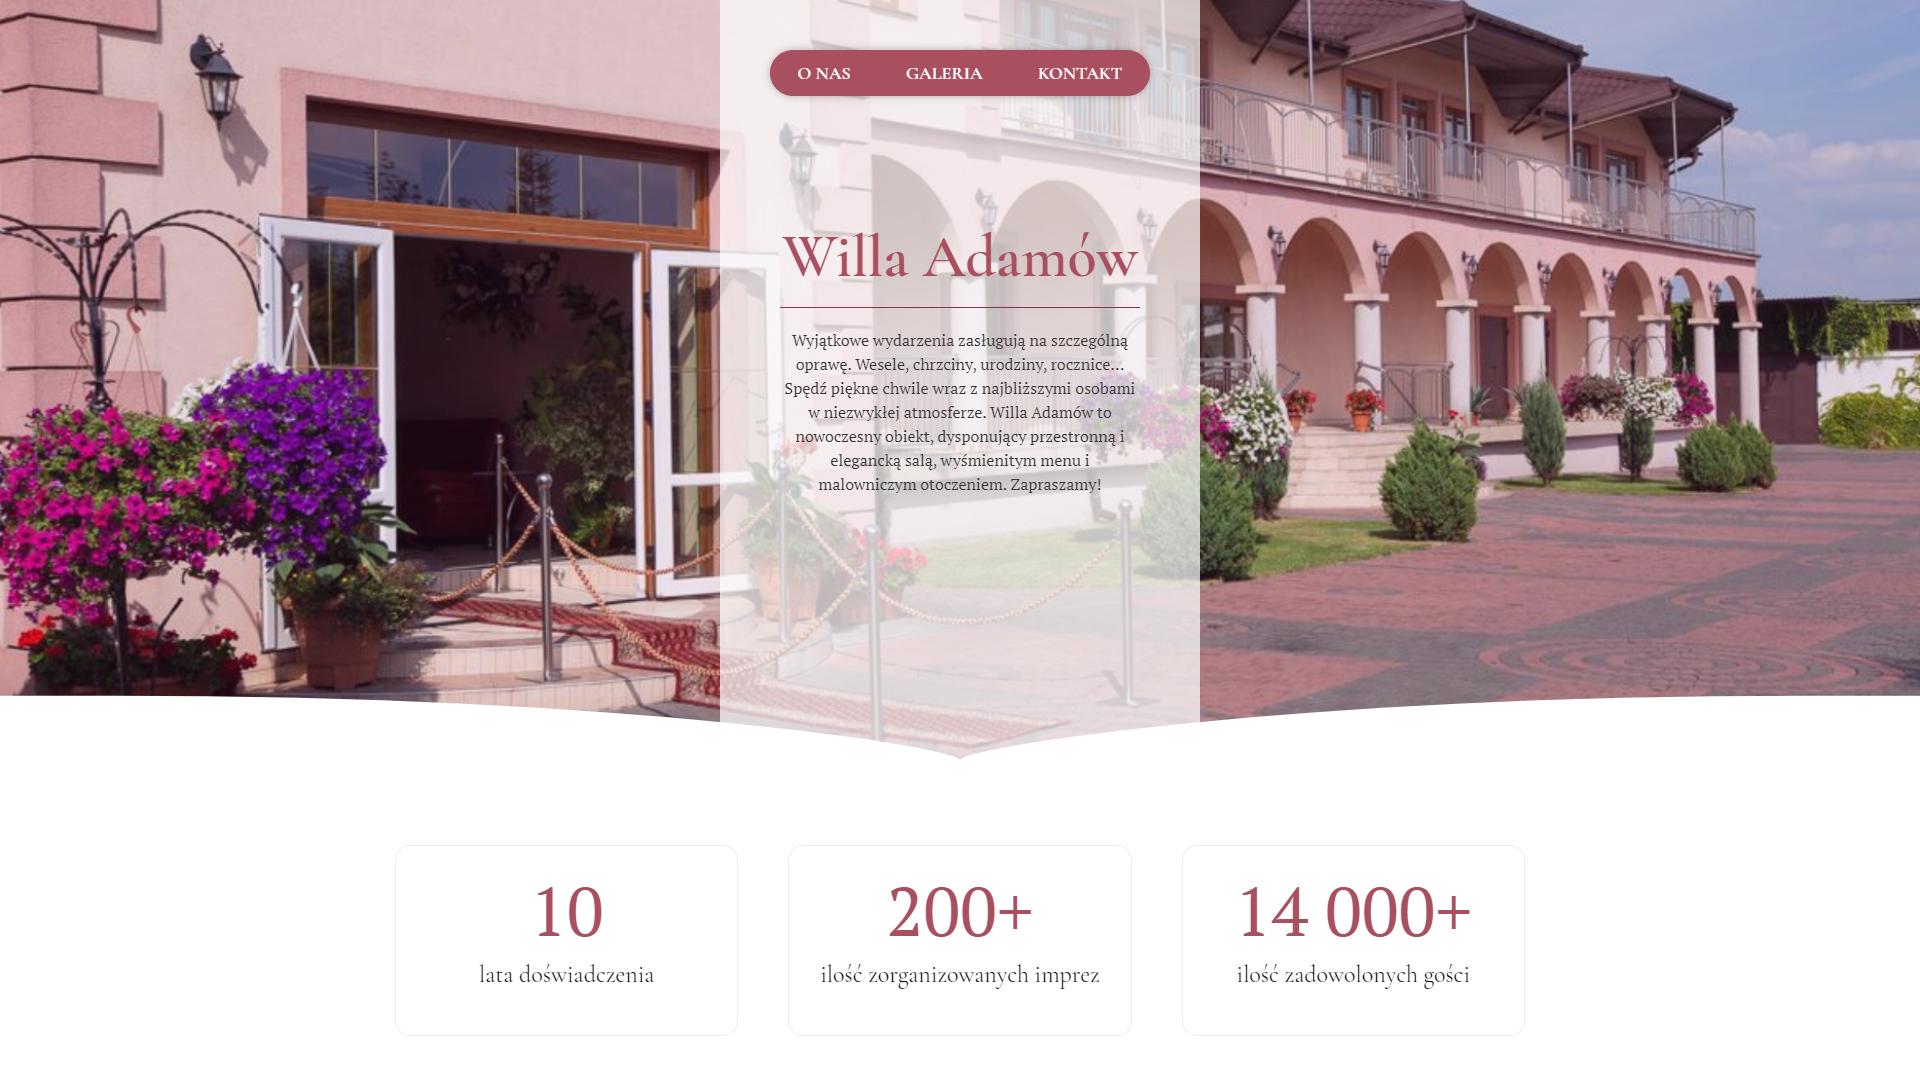 willaadamow.pl_(Full HD) (1)